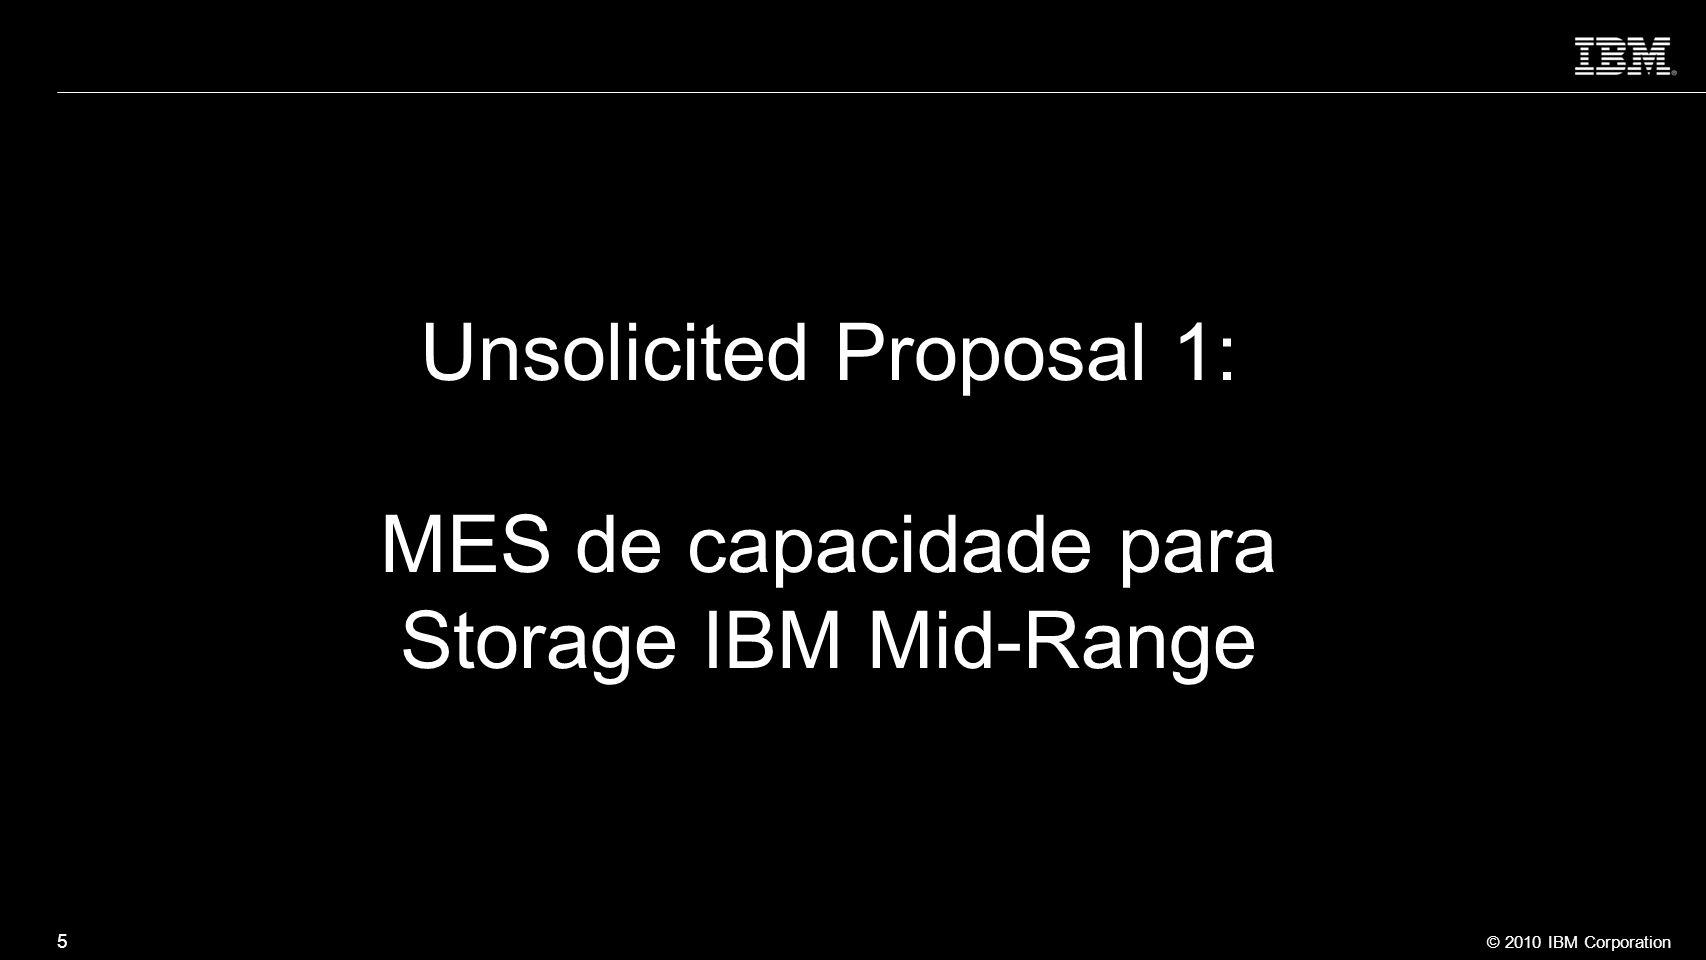 © 2010 IBM Corporation 5 Unsolicited Proposal 1: MES de capacidade para Storage IBM Mid-Range